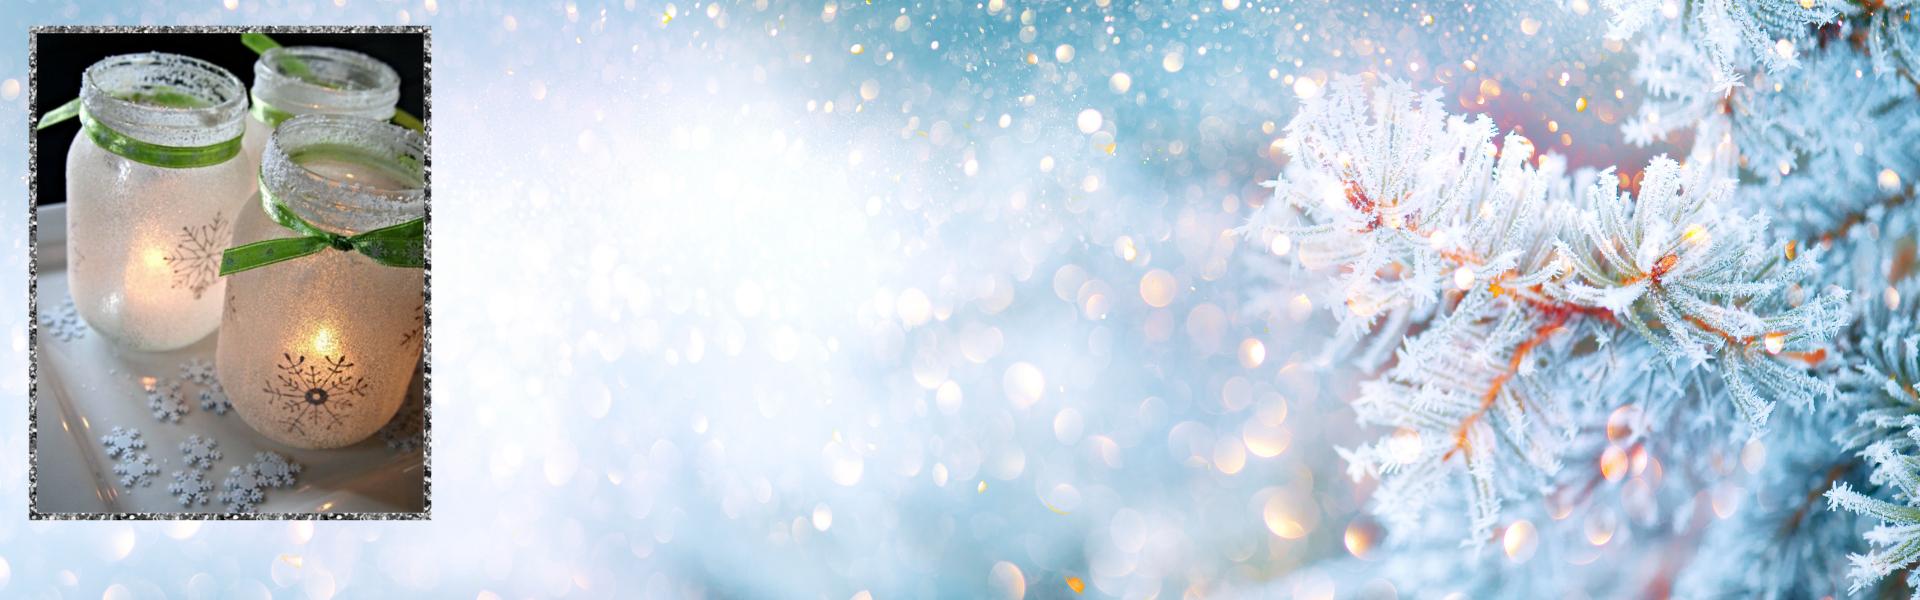 Grab & Go Kit: Sparkling Winter Luminaries (Gr. 6-12)